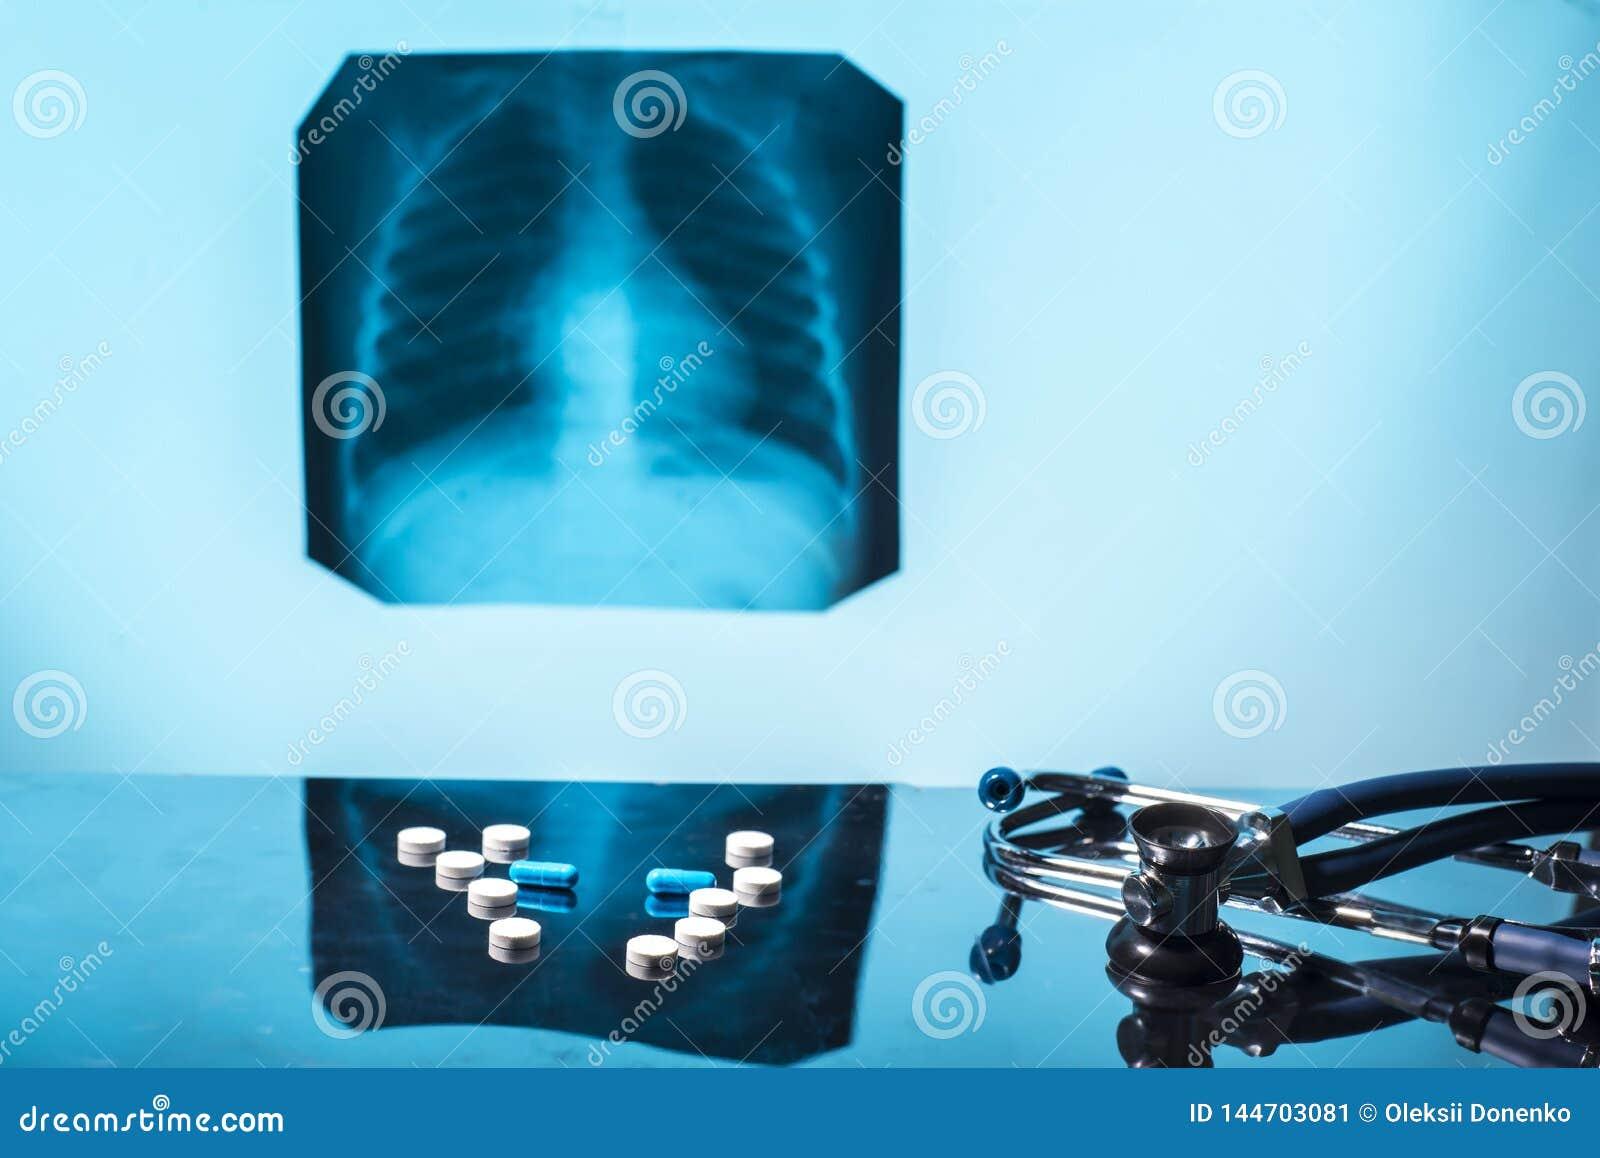 Pulmonary tuberculosis treatment concept. Medical still life pills stethoscope x-ray